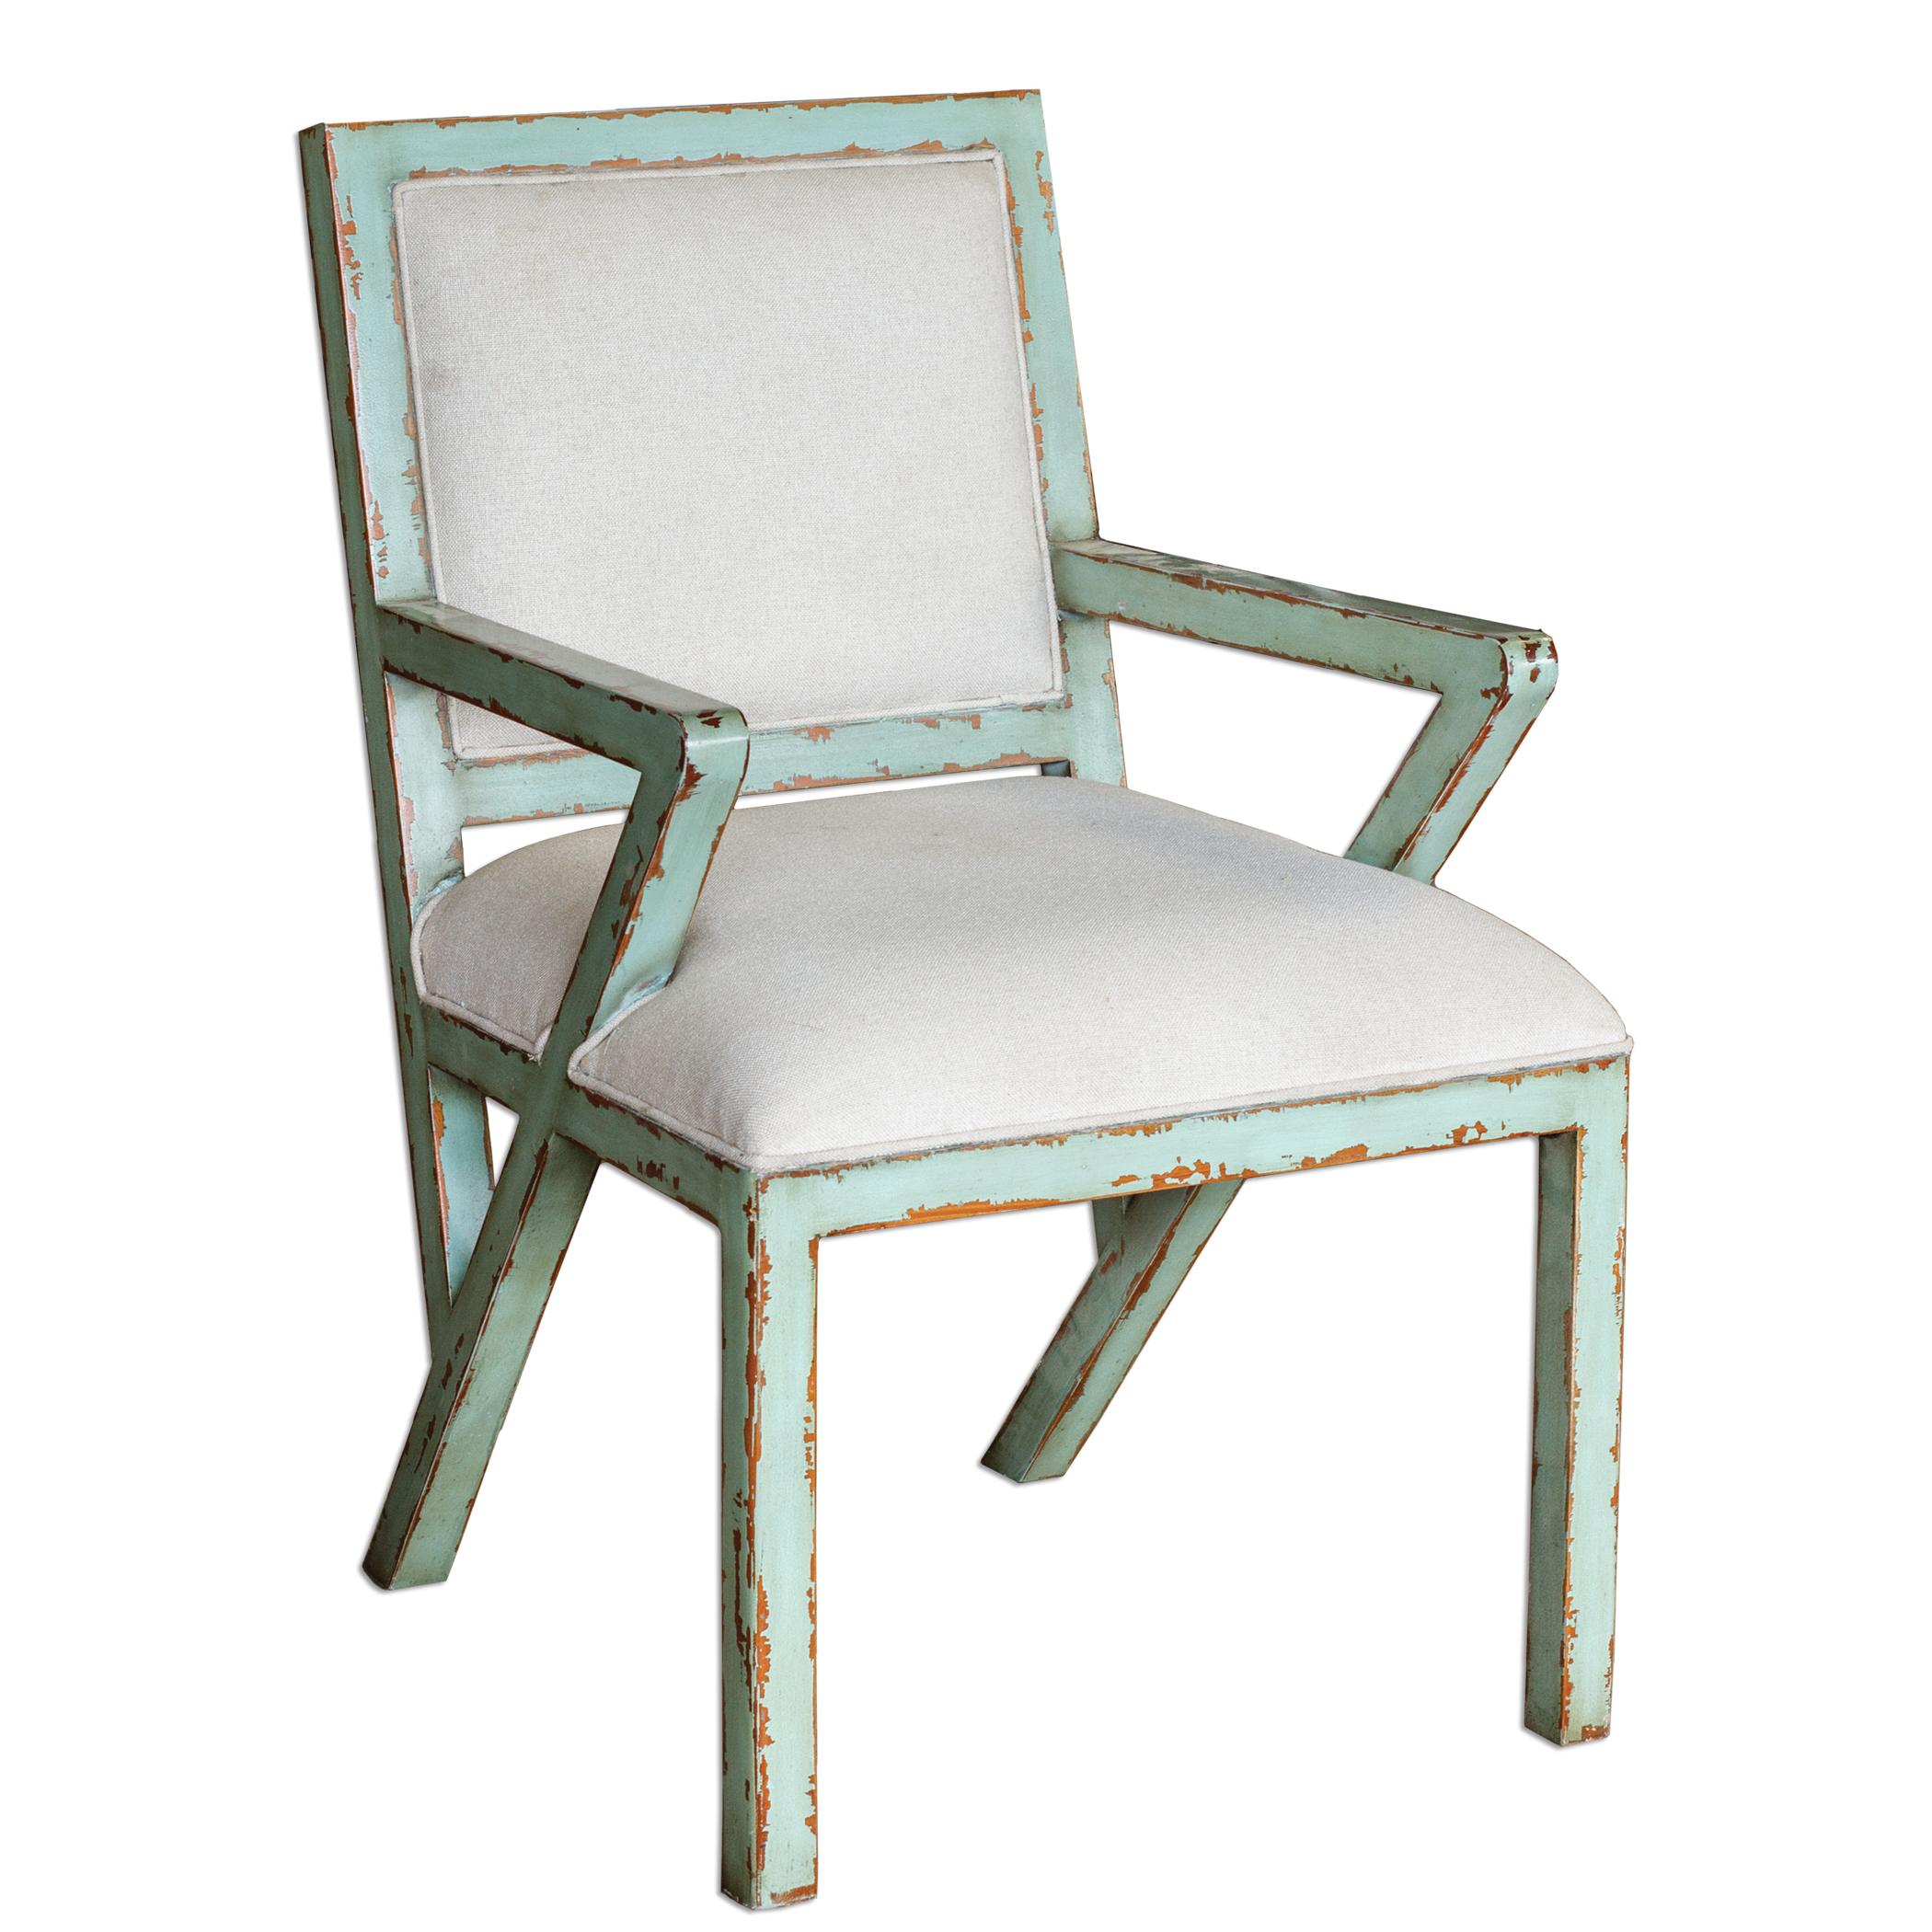 Uttermost Accent Furniture Zenia Seaglass Green Armchair - Item Number: 23649